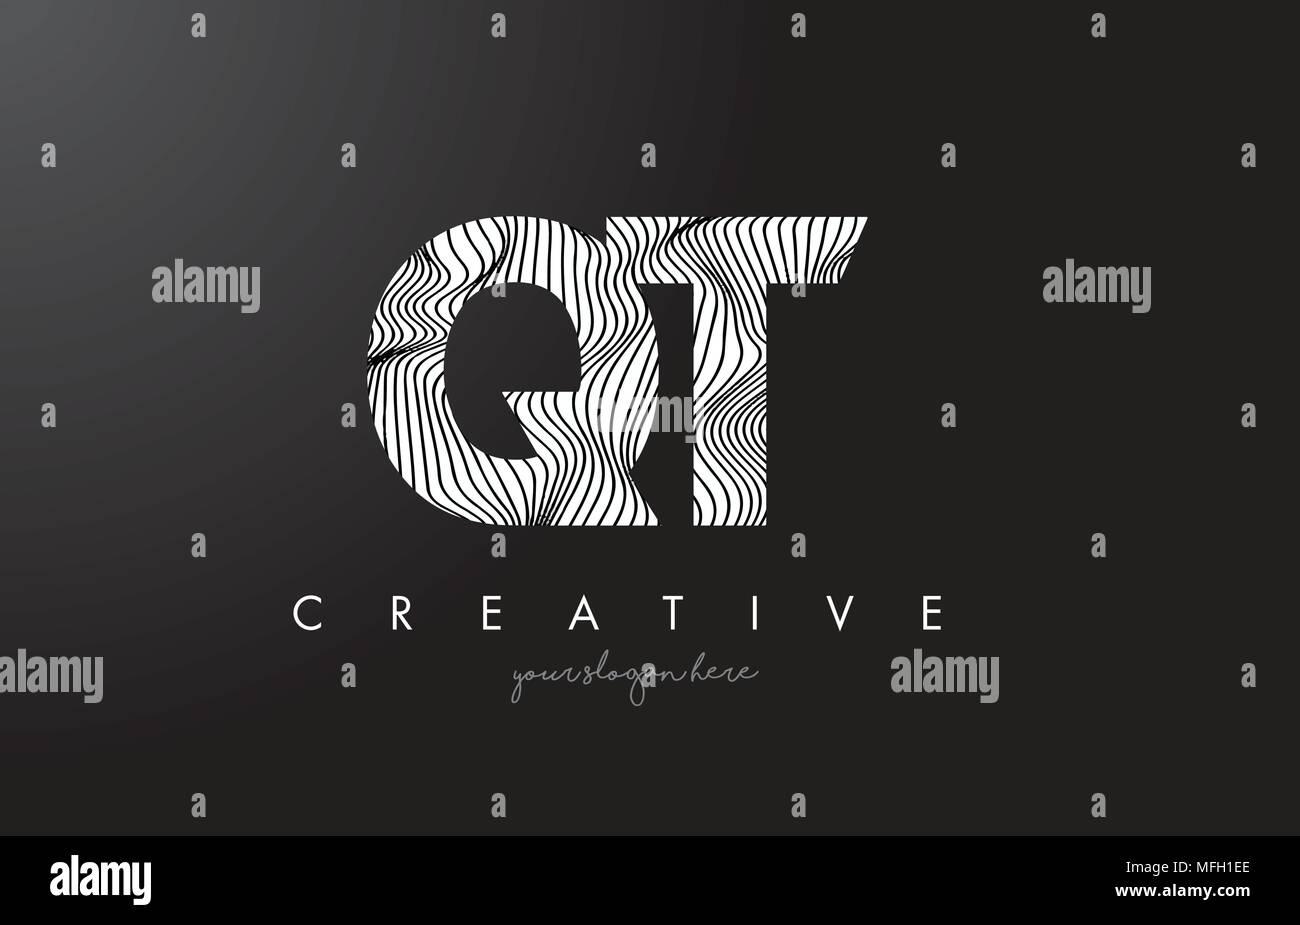 QT Q T Letter Logo with Zebra Lines Texture Design Vector Illustration. - Stock Image